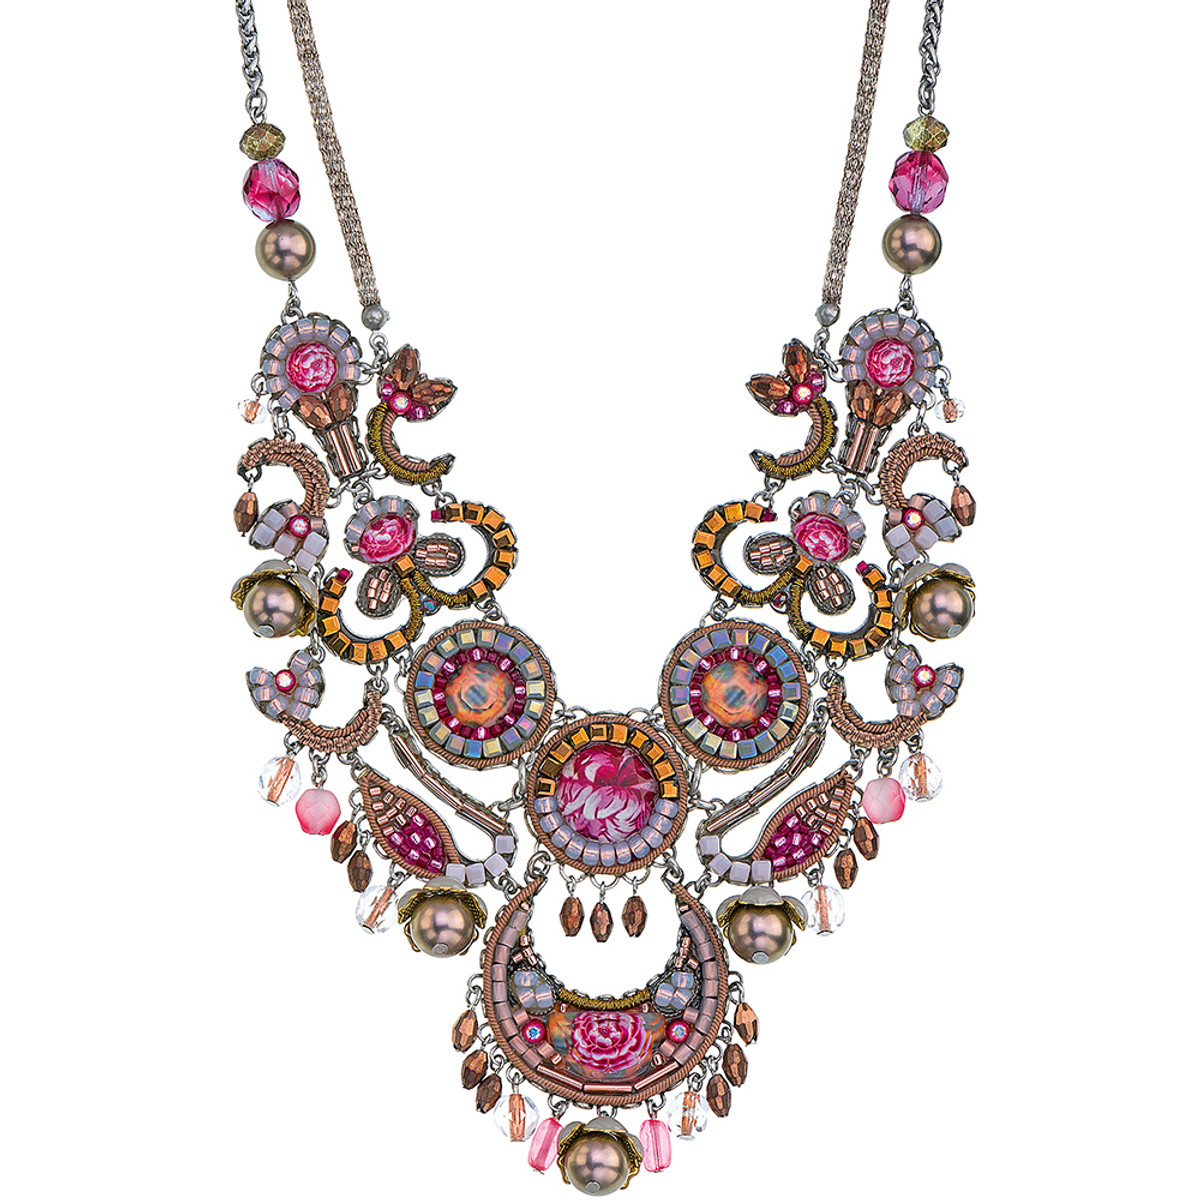 Ayala Bar Secret Cave Limited Edition Necklace